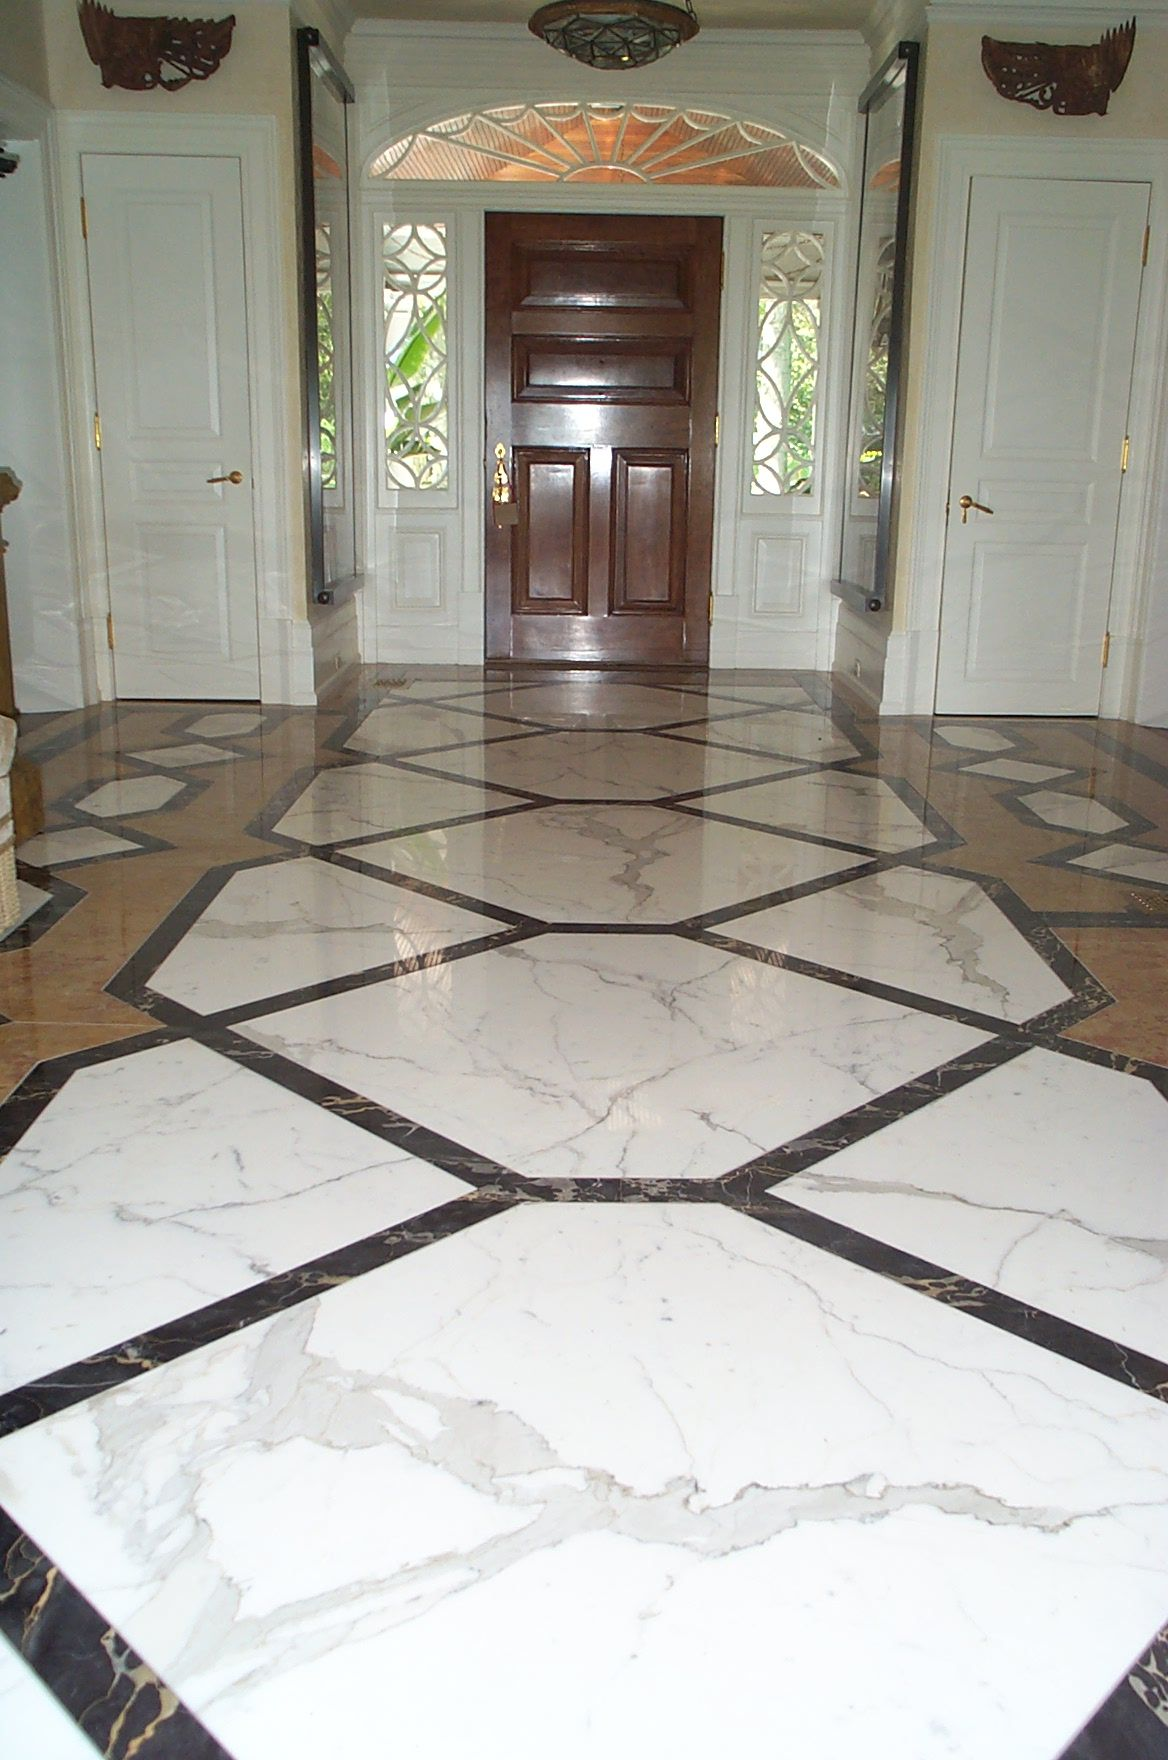 This stunning entryway features Calacatta White Portoro